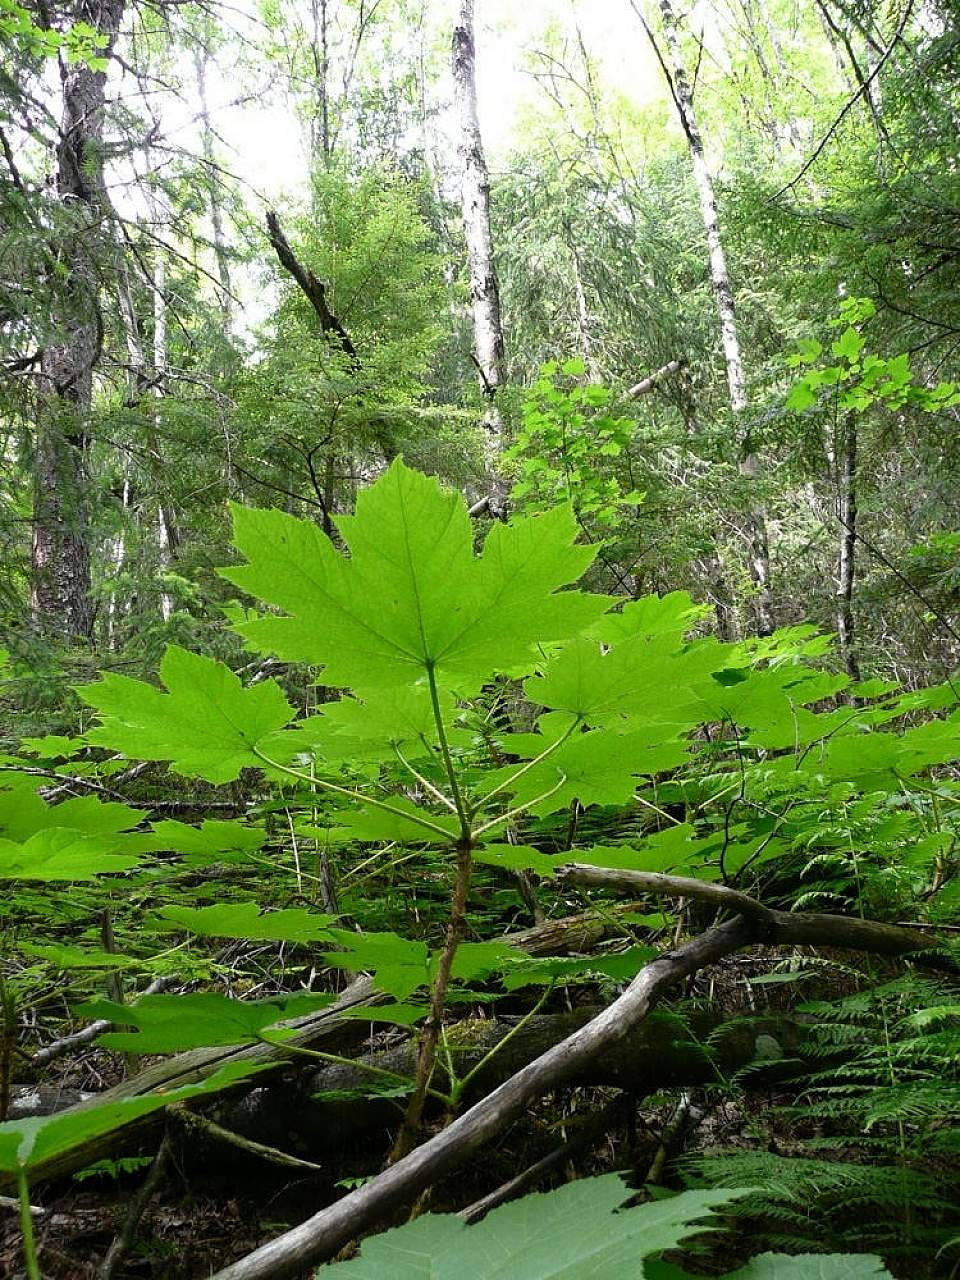 Alaska species plants flowers Devils Club Battery Point Hike Matthew Hawthorne